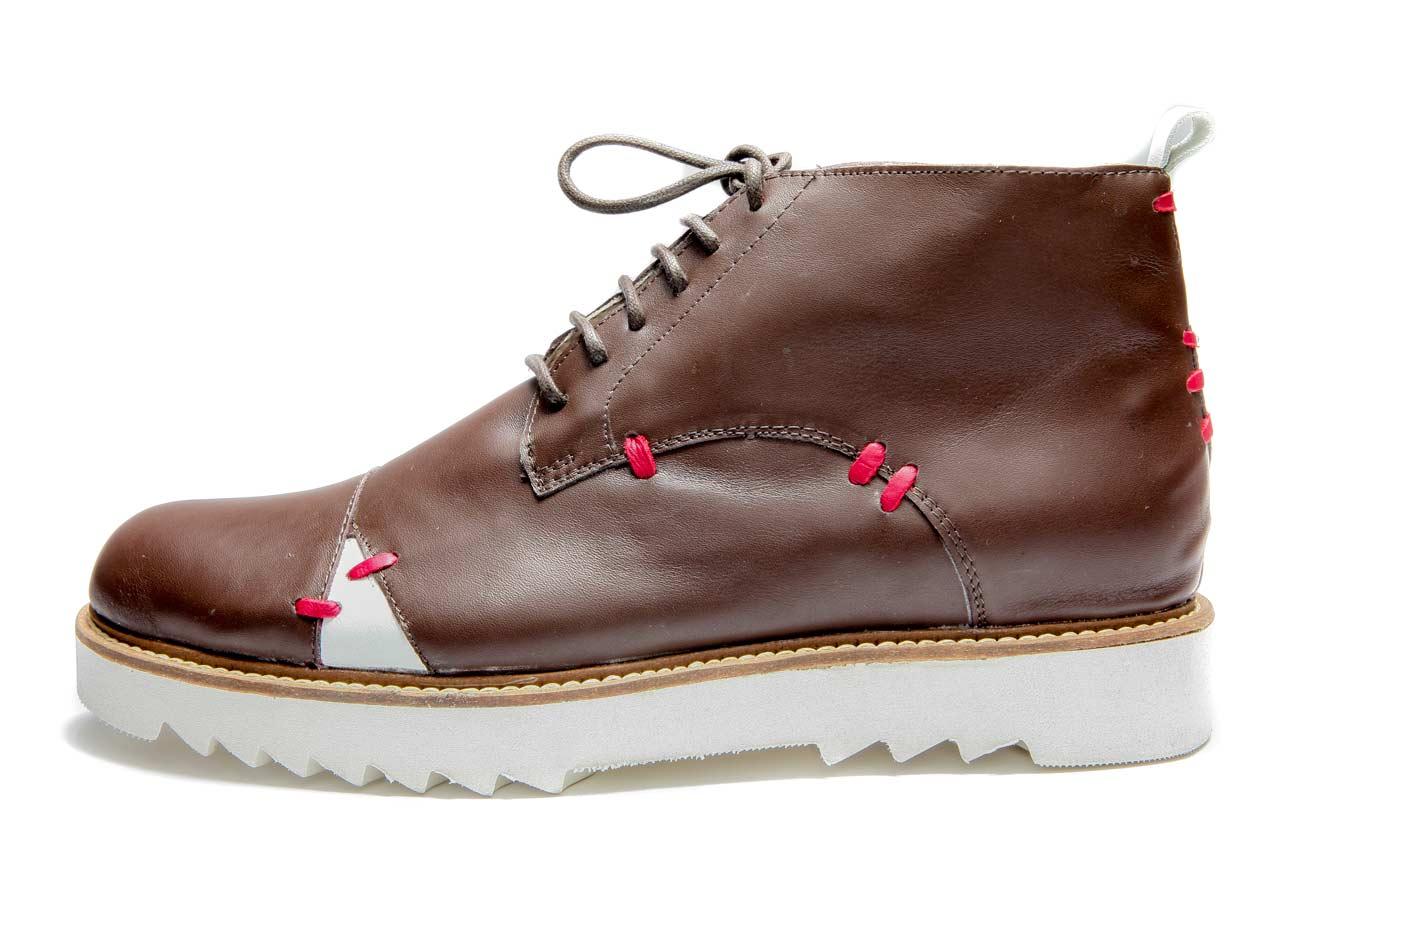 Brown mens derby shoes | Men's ankle